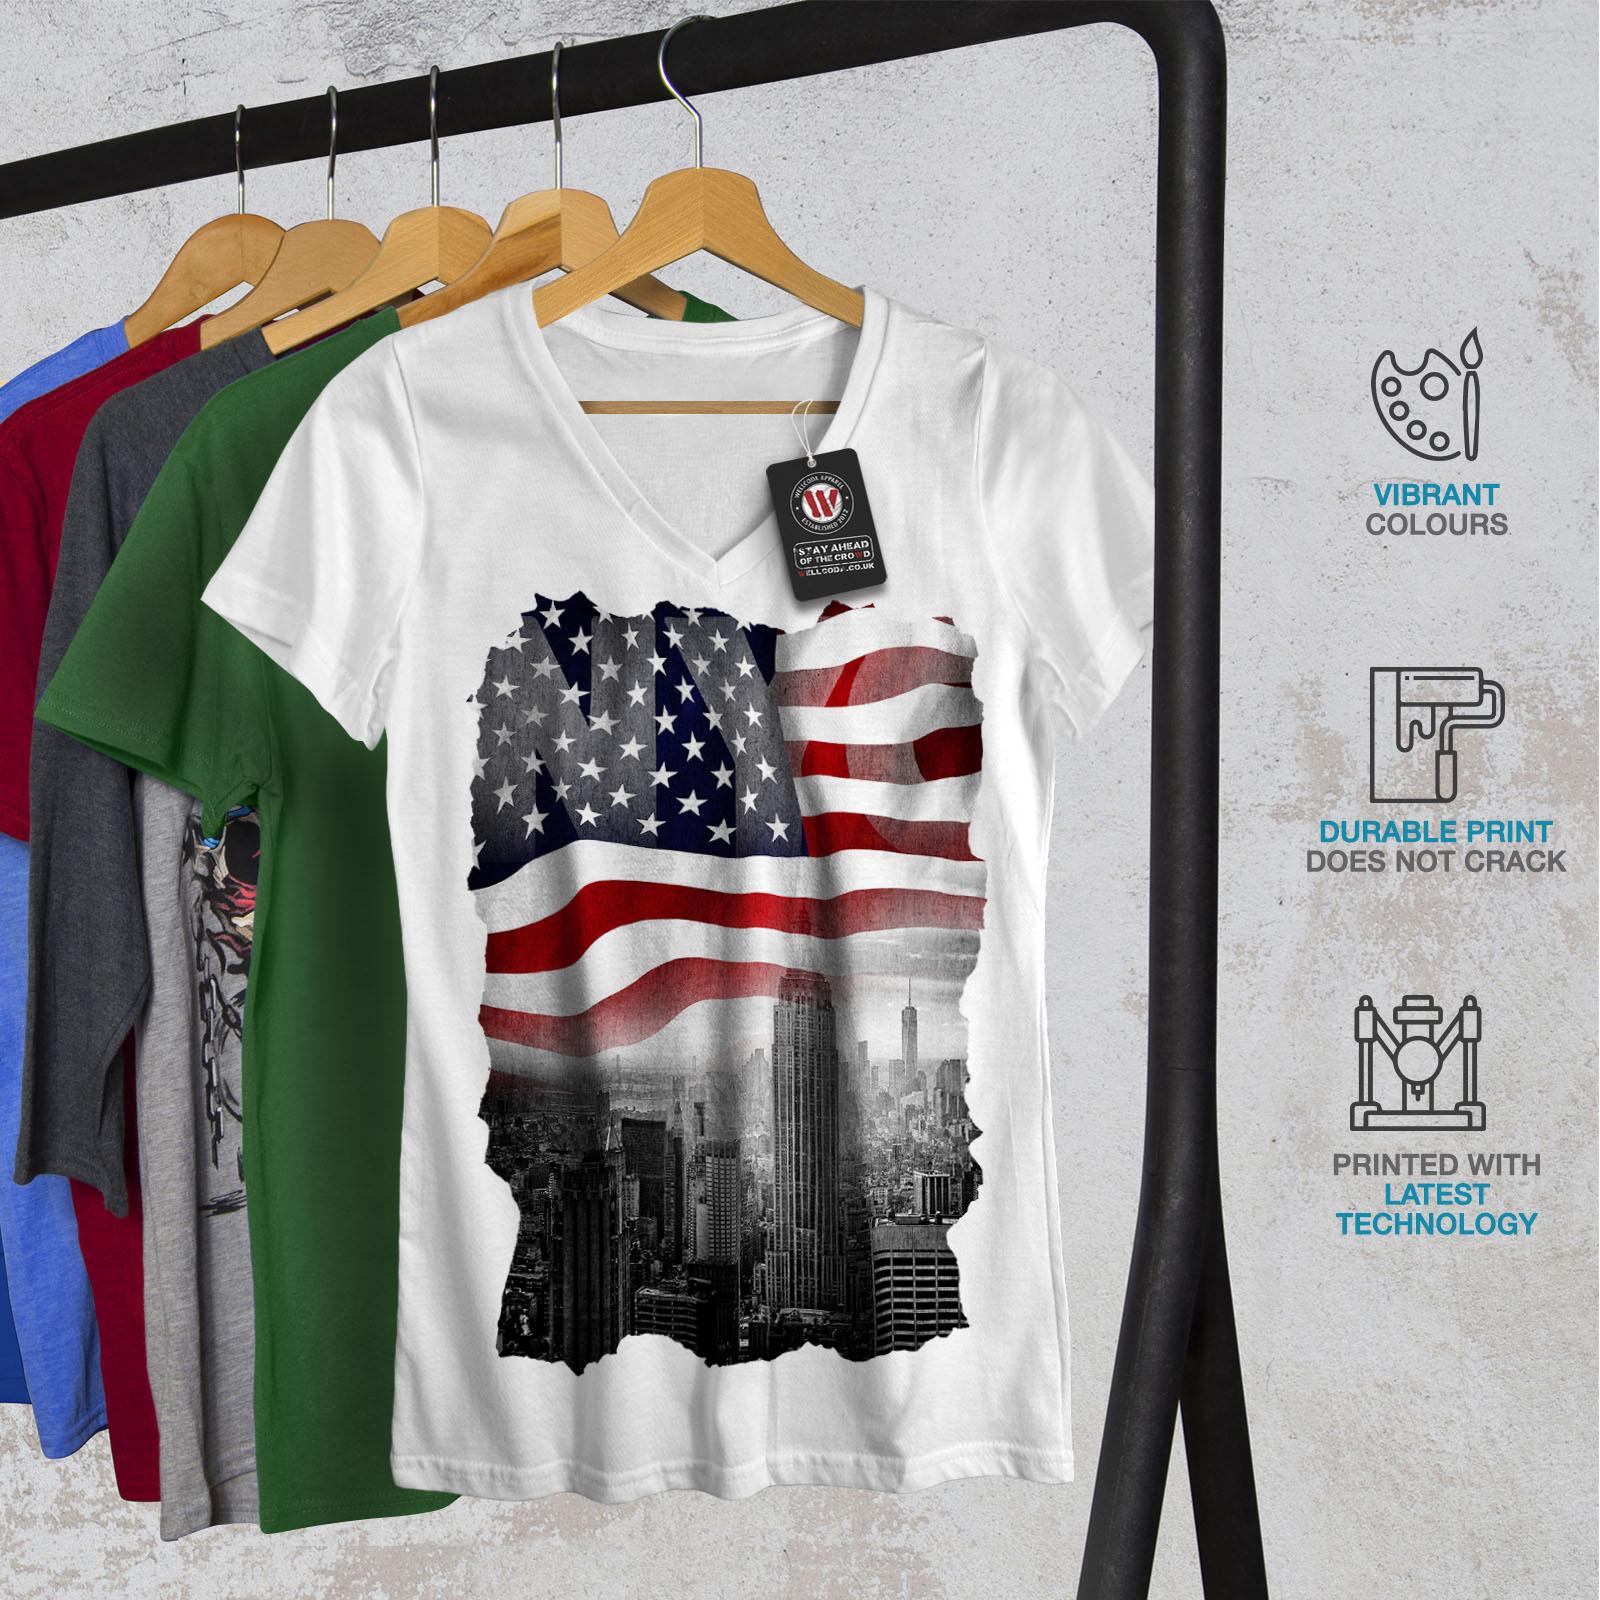 Wellcoda-New-York-City-Flag-Womens-V-Neck-T-shirt-NY-Graphic-Design-Tee thumbnail 8